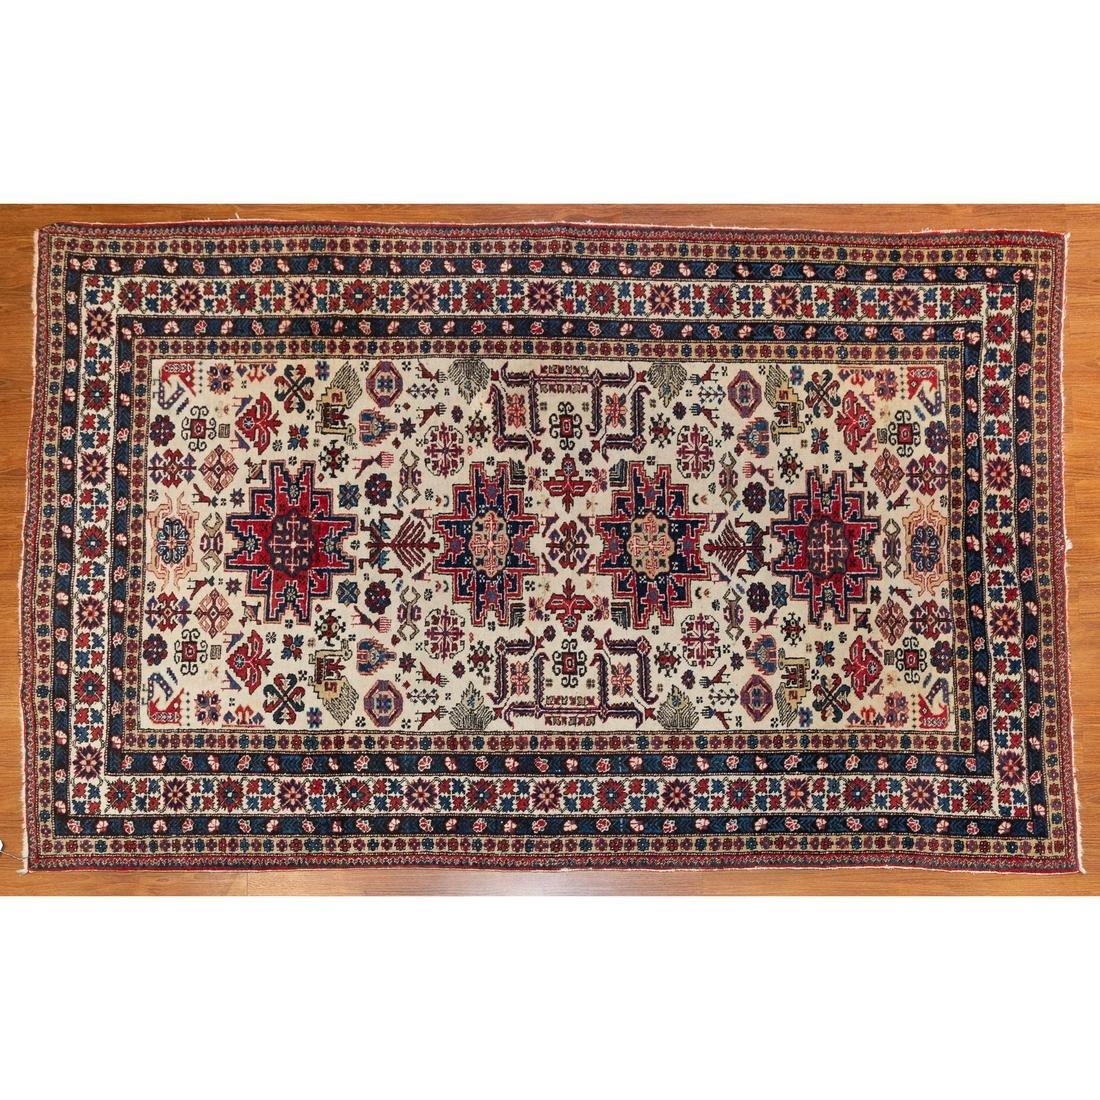 Ardebil Rug, Persia, 4.7 x 6.11